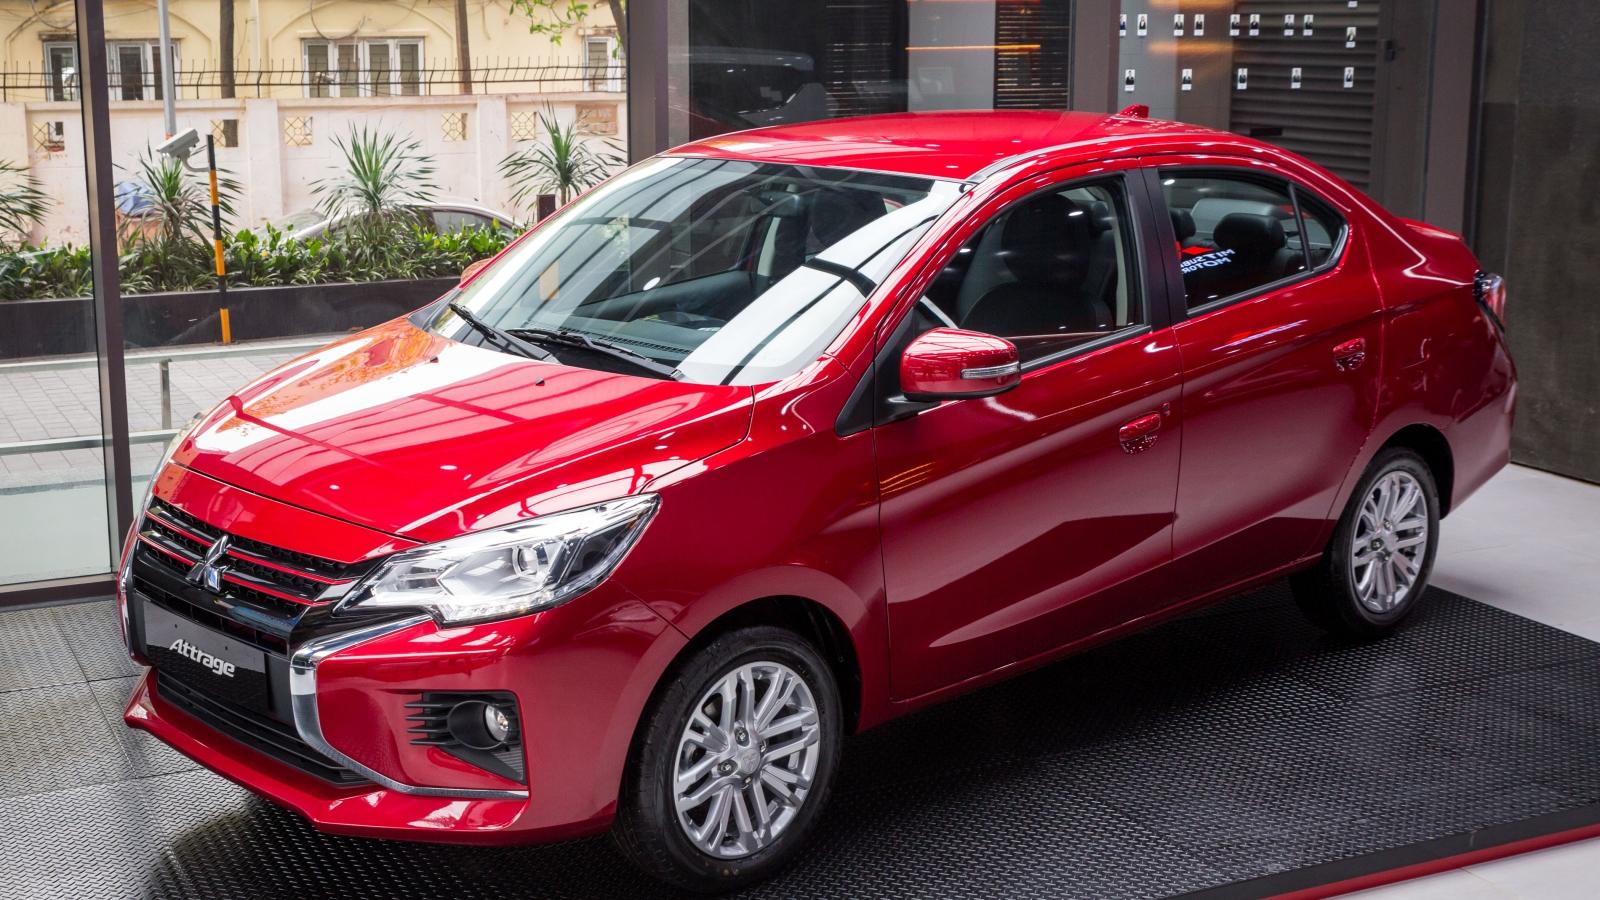 Khám phá Mitsubishi Attrage Premium